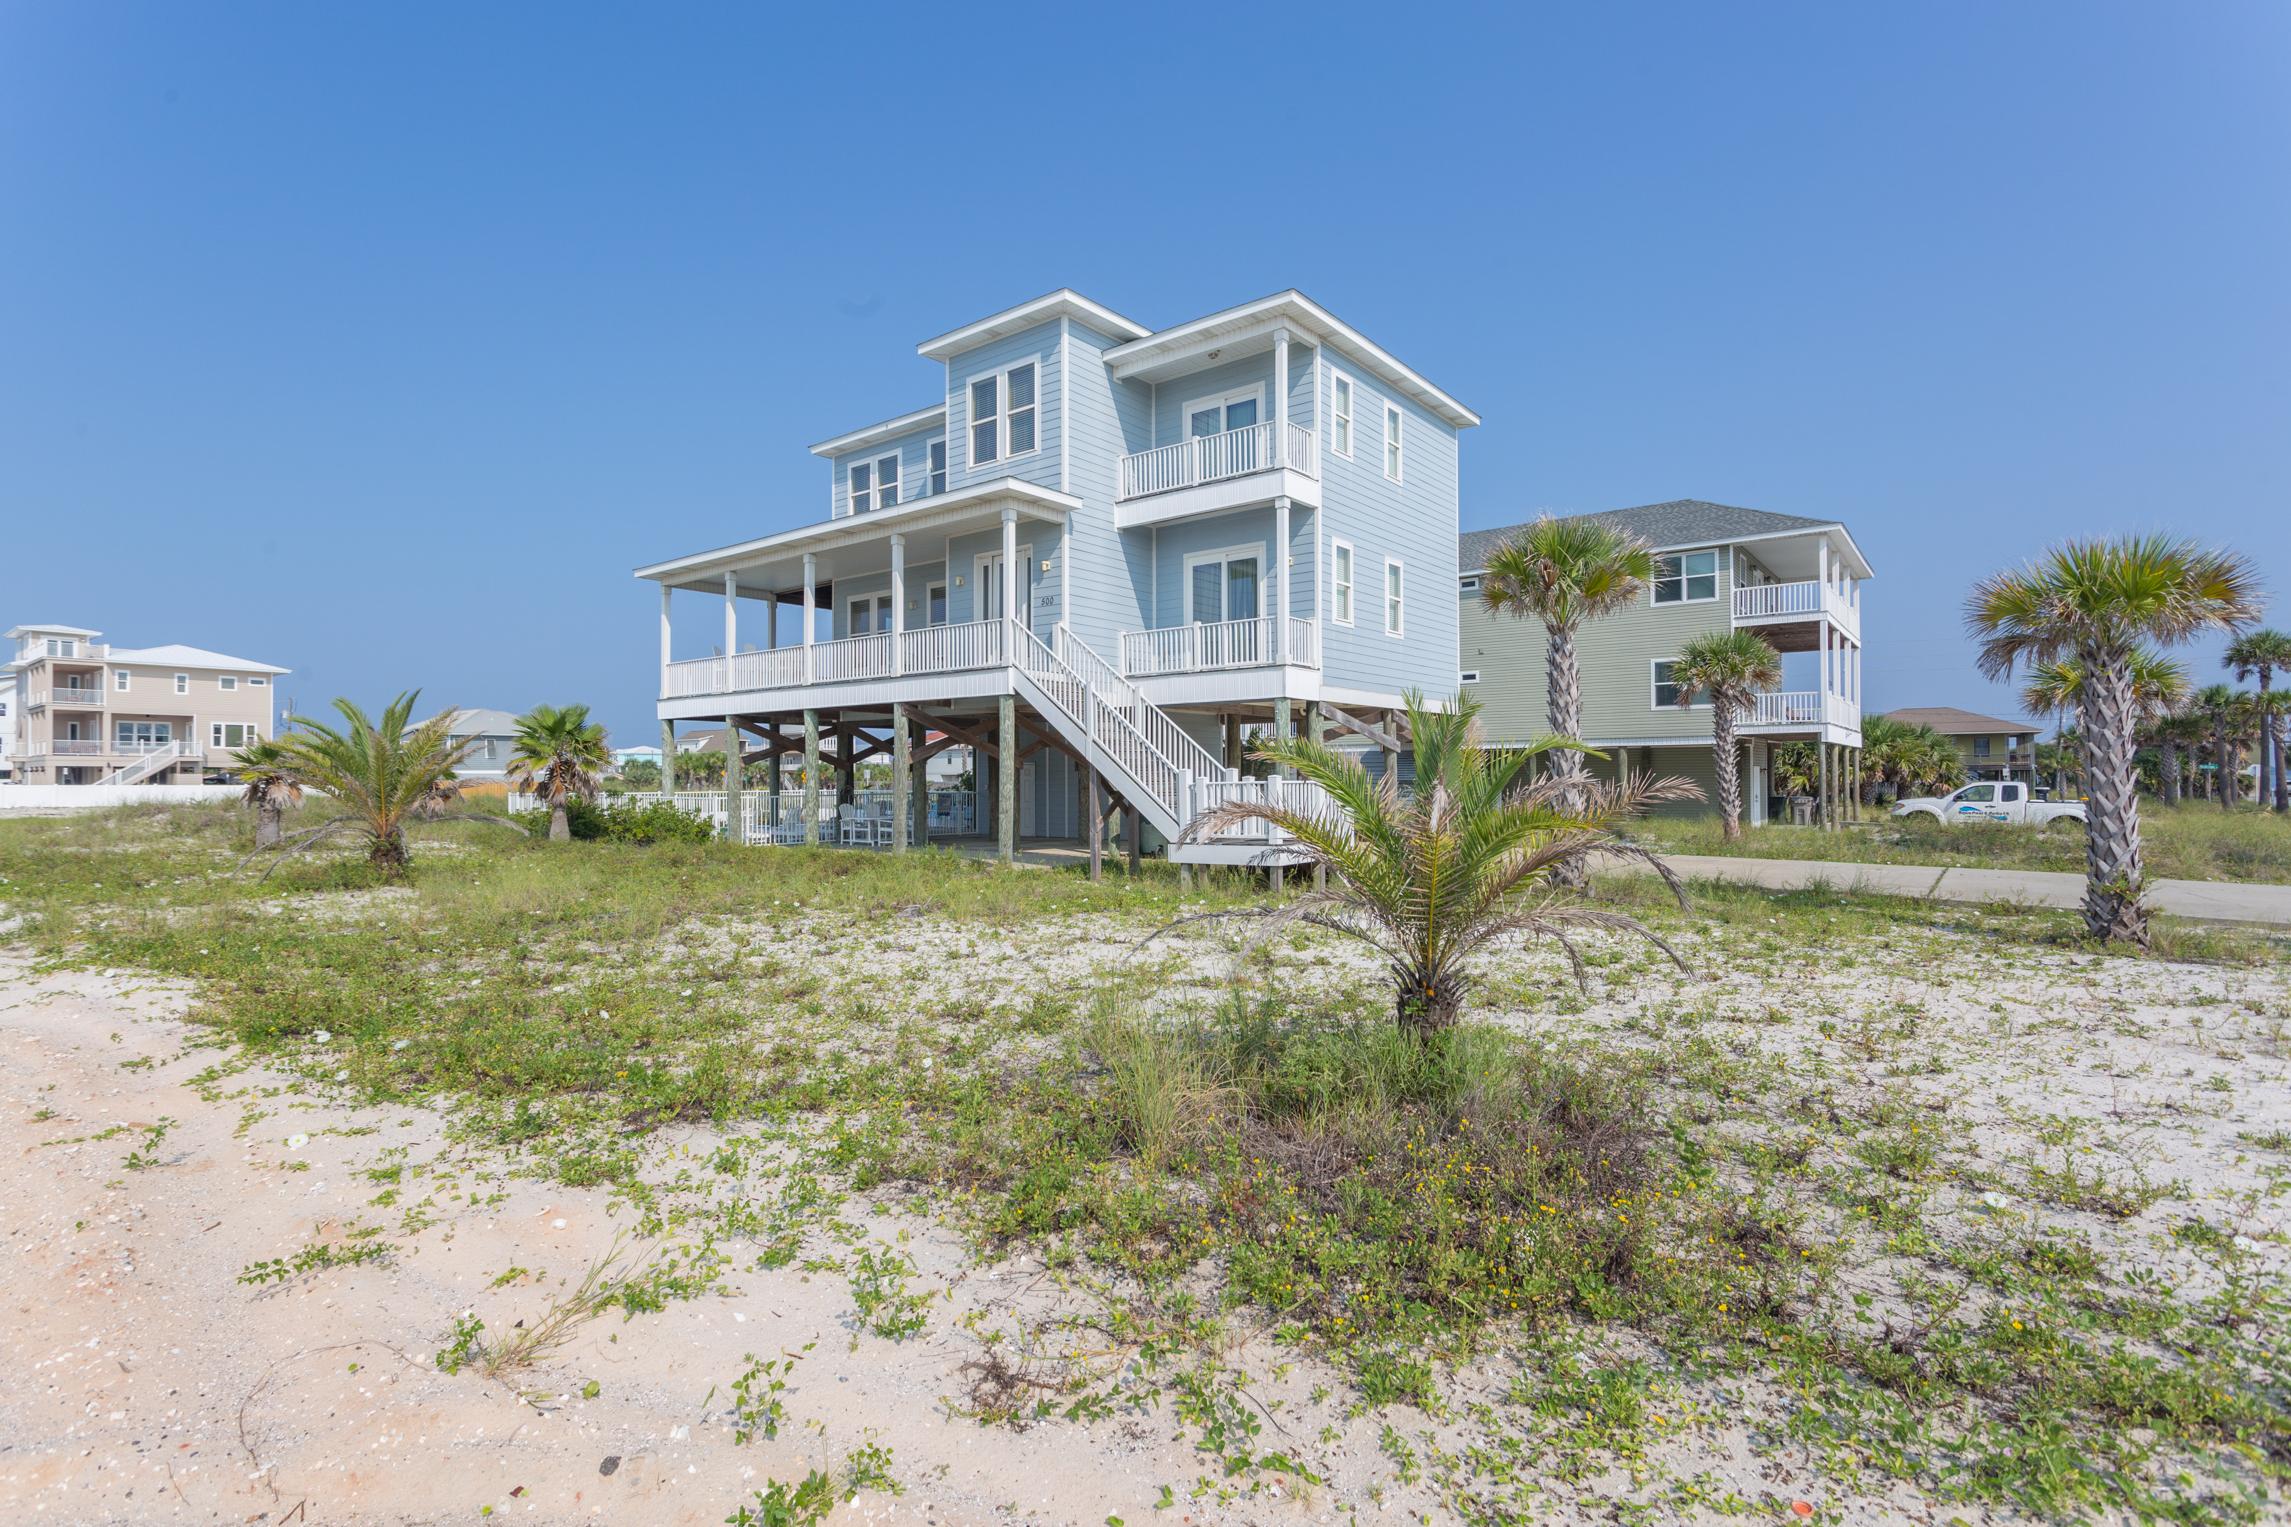 Maldonado 500 House/Cottage rental in Pensacola Beach House Rentals in Pensacola Beach Florida - #33